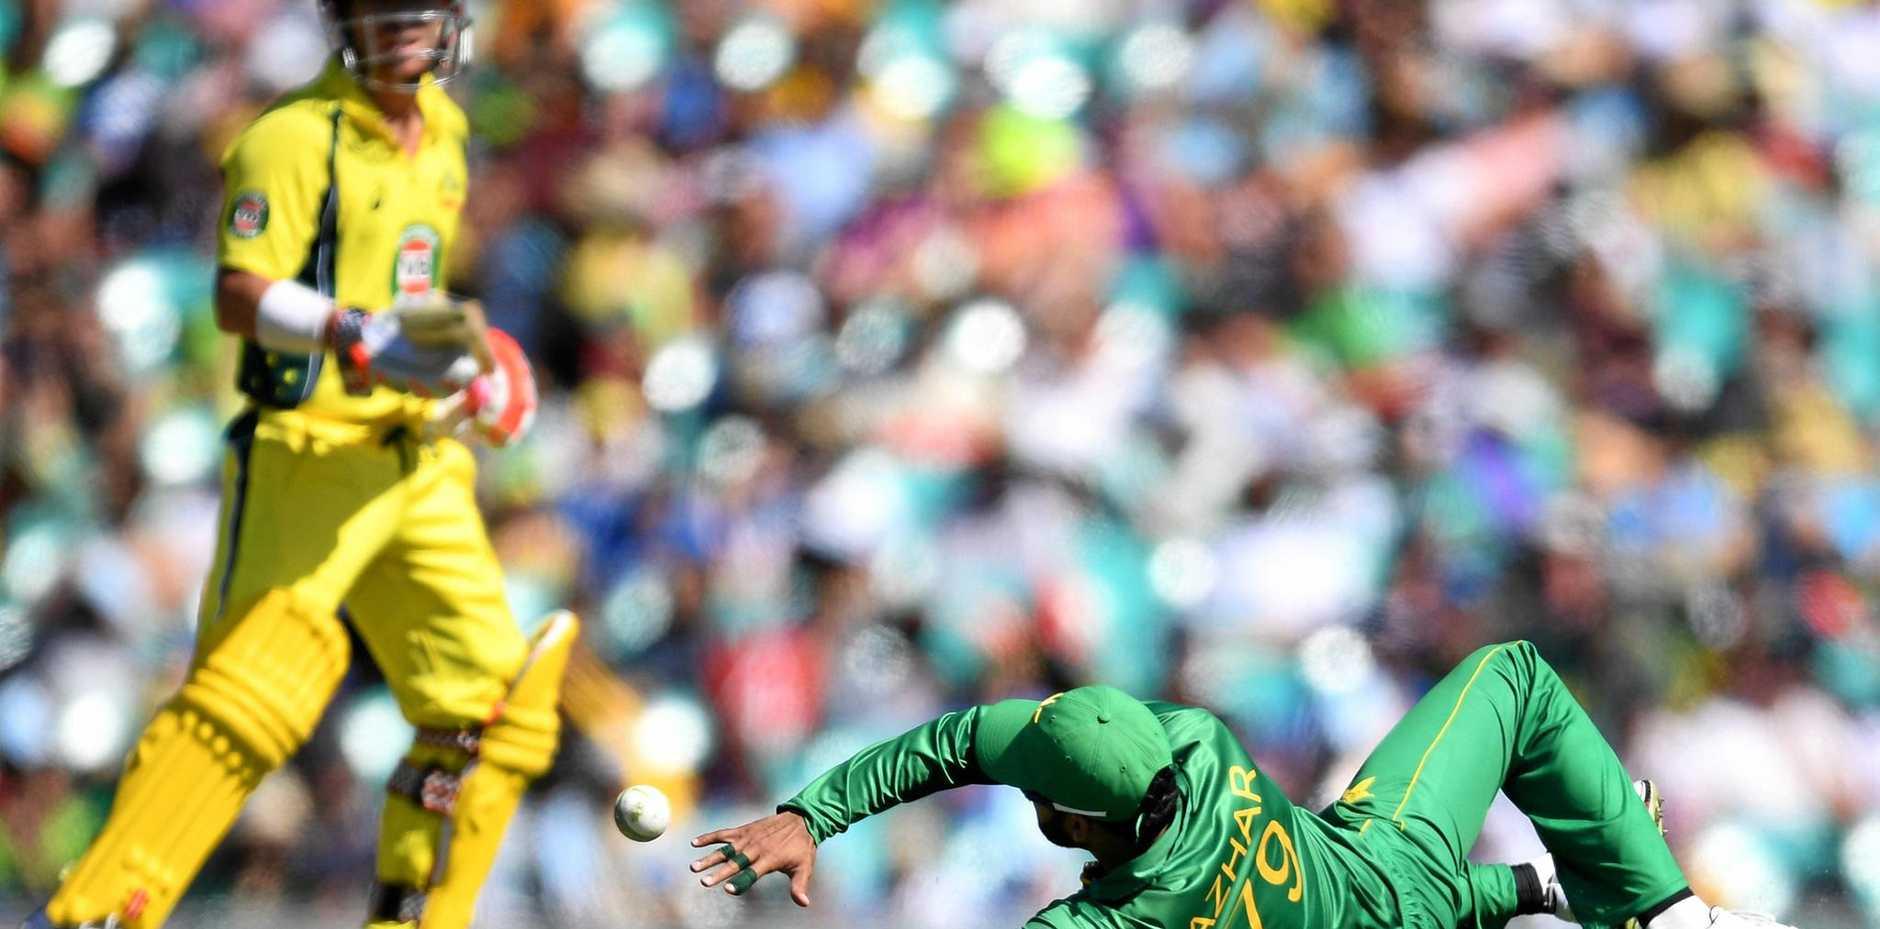 Azhar Ali (right) of Pakistan misfields a ball hit by Steve Smith of Australia